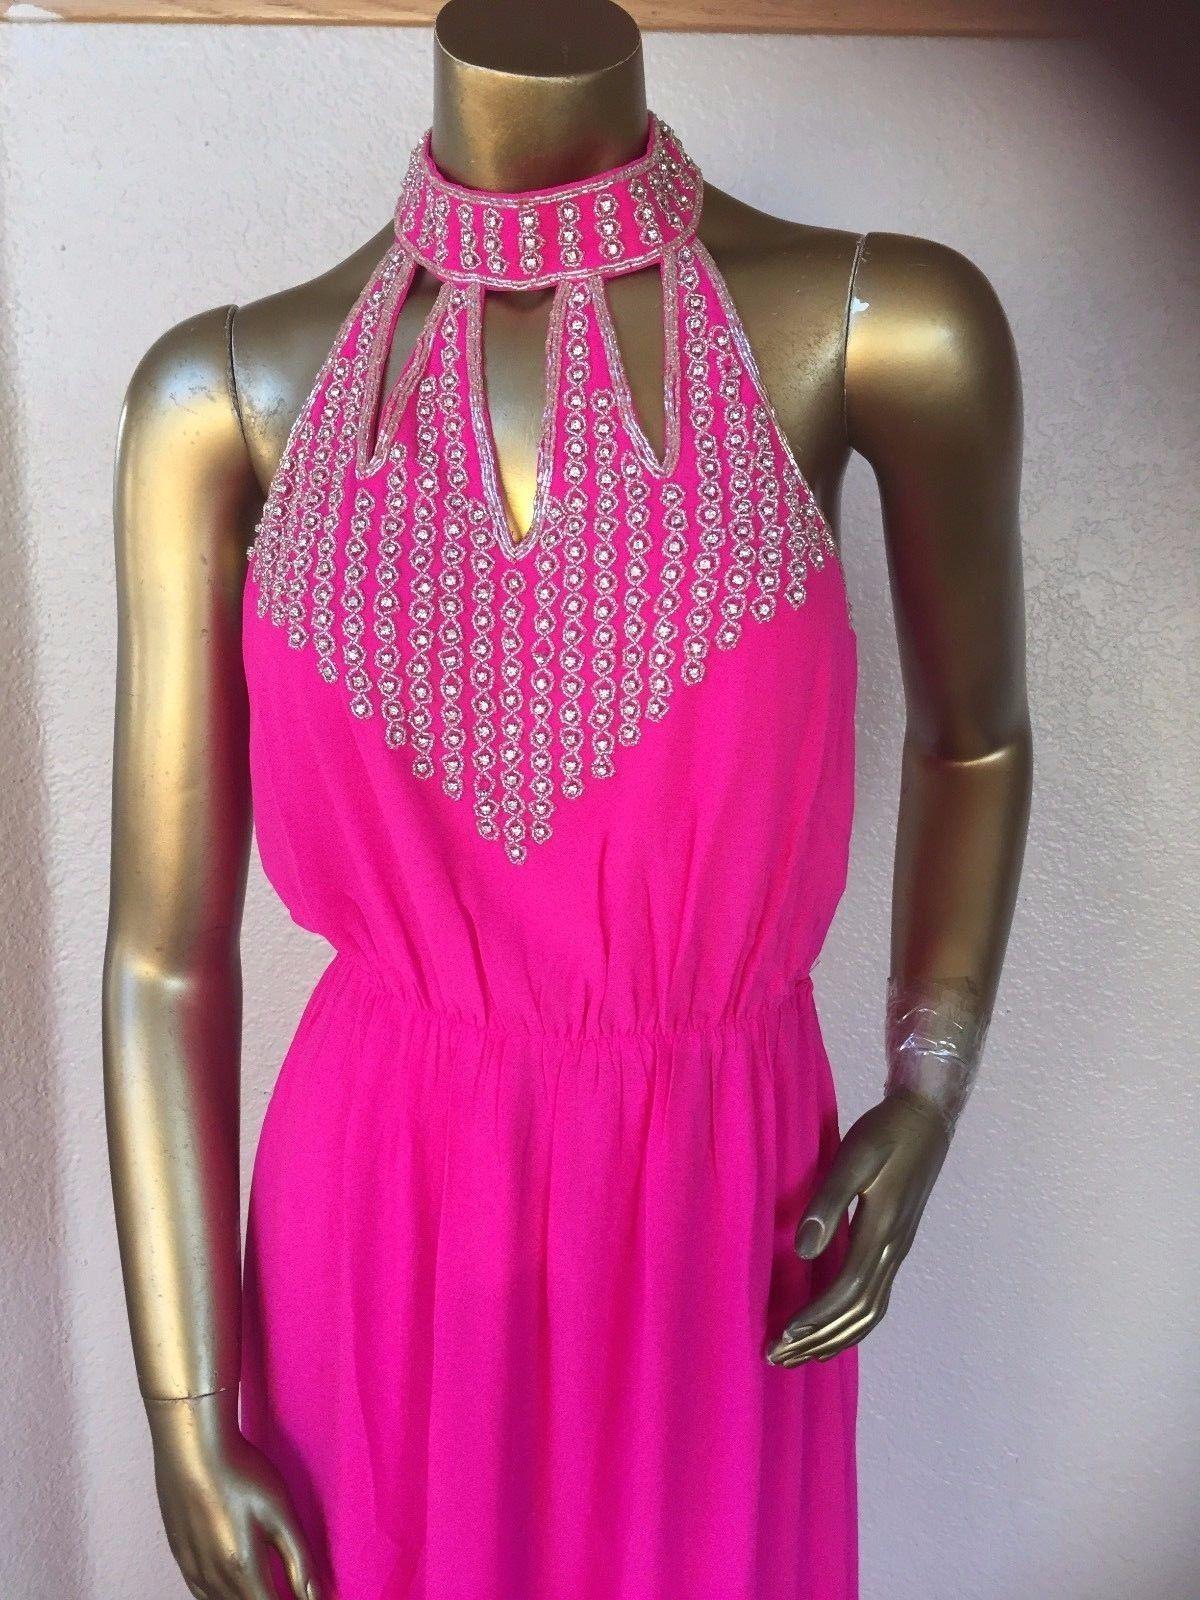 New fashion womenus hot pink long dress lcute t